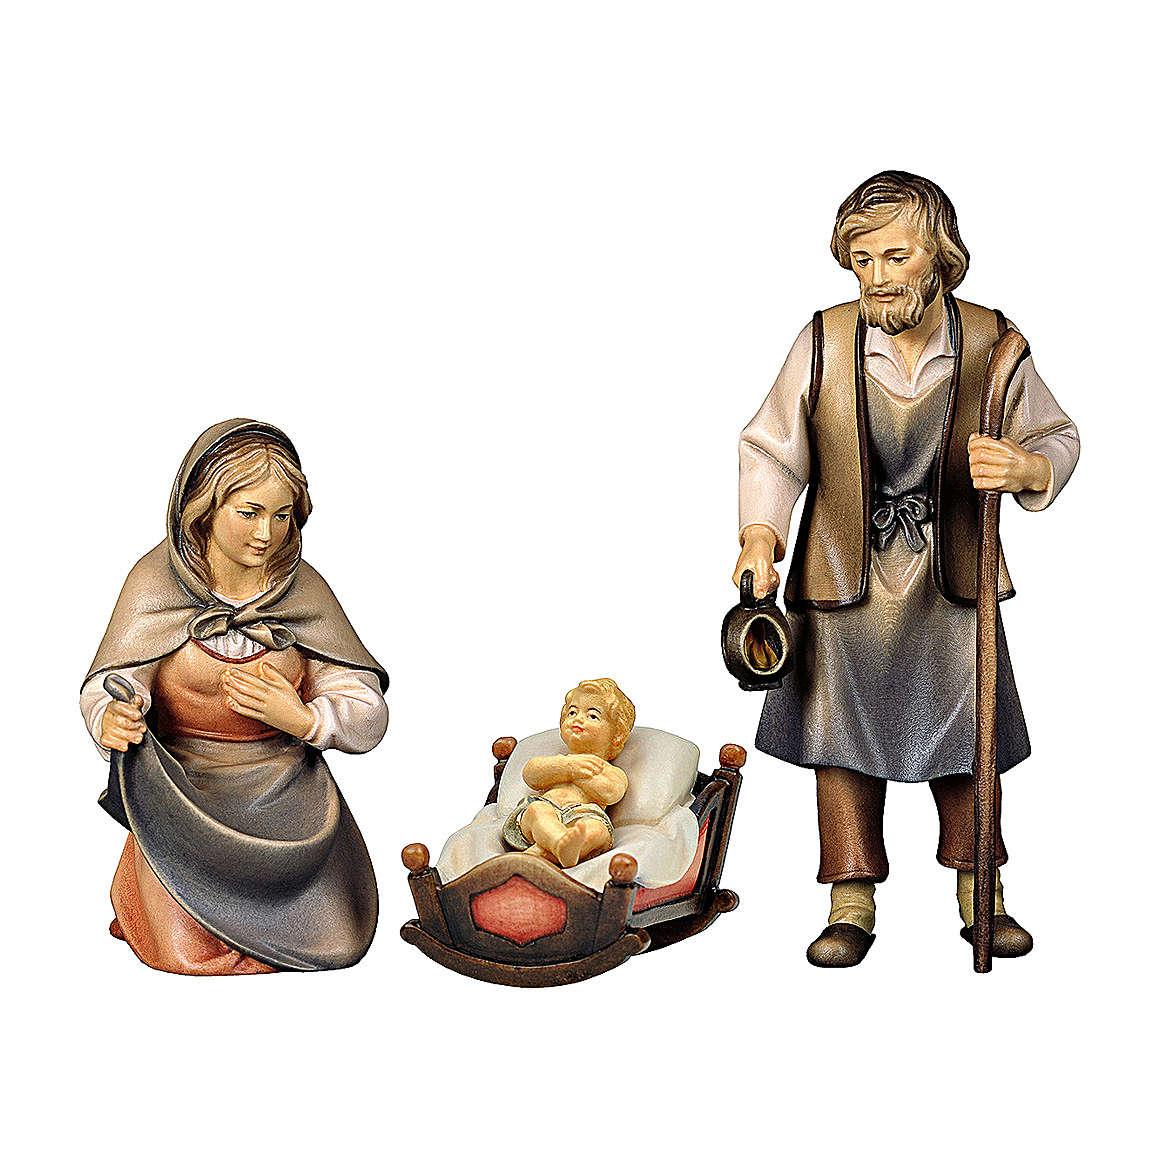 Sacra famiglia con dondolo presepe Original Pastore legno dipinto in Val Gardena 12 cm 4